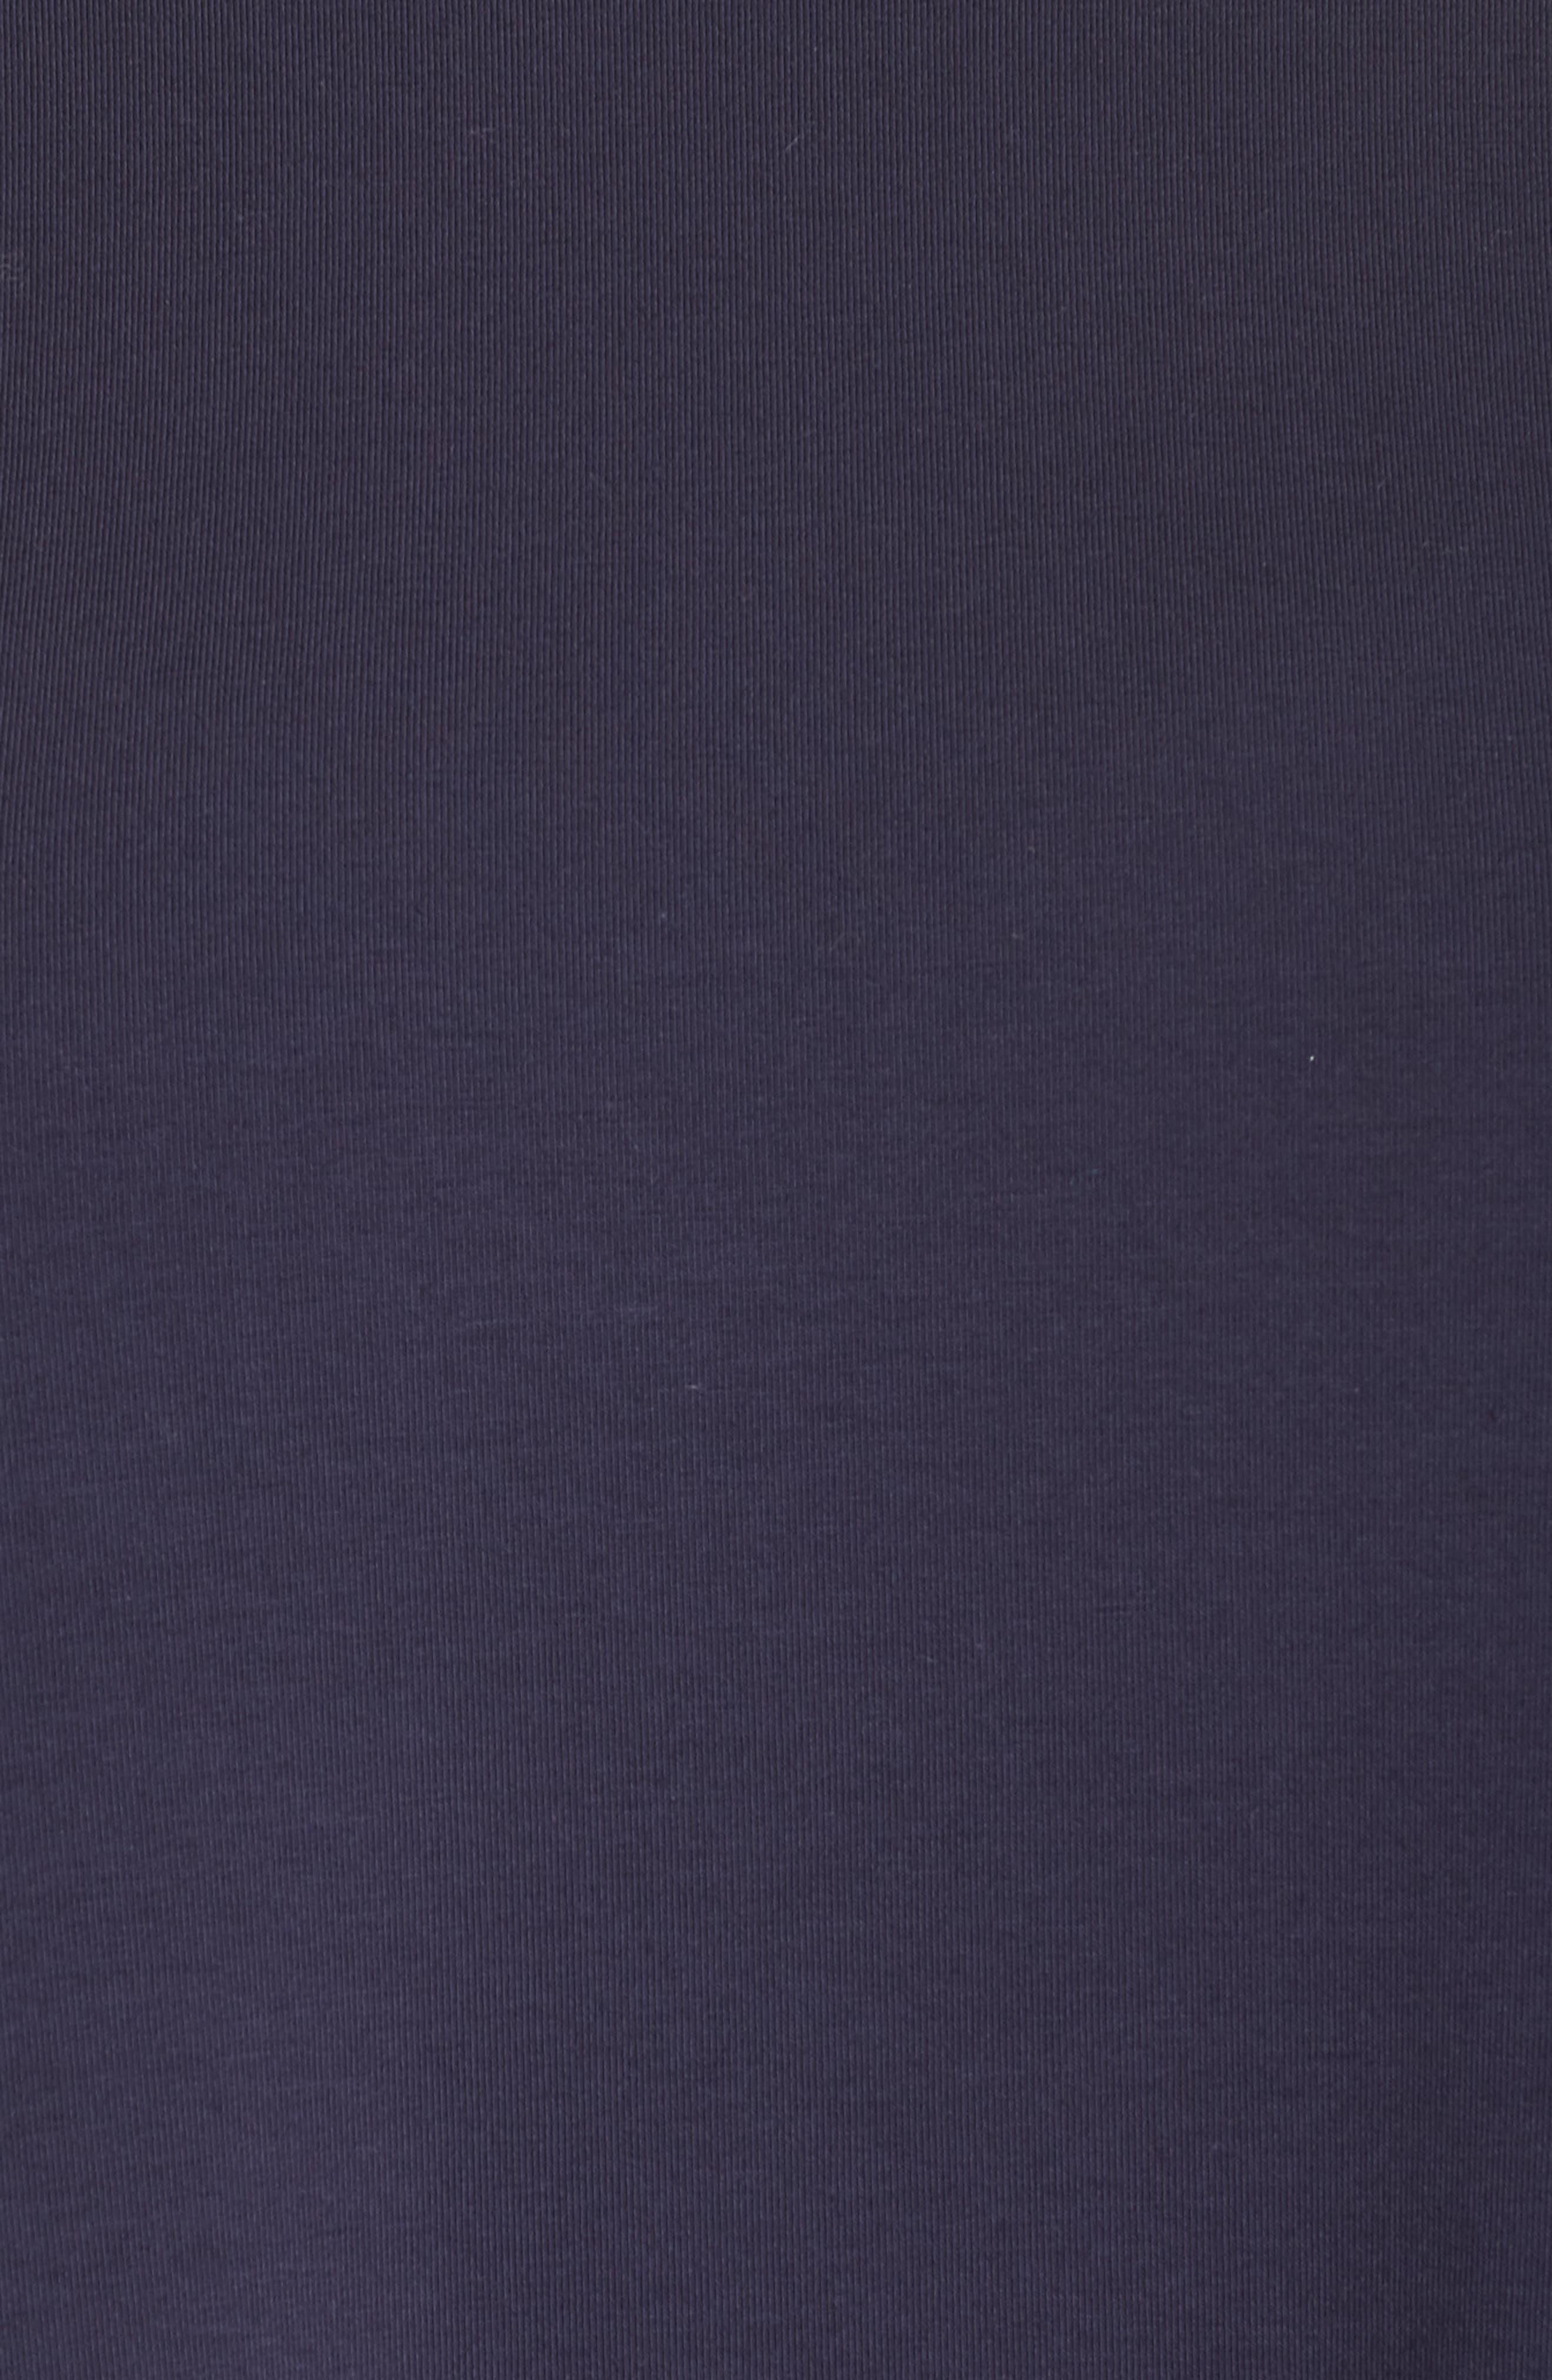 Knit Jersey Dress,                             Alternate thumbnail 5, color,                             Midnight